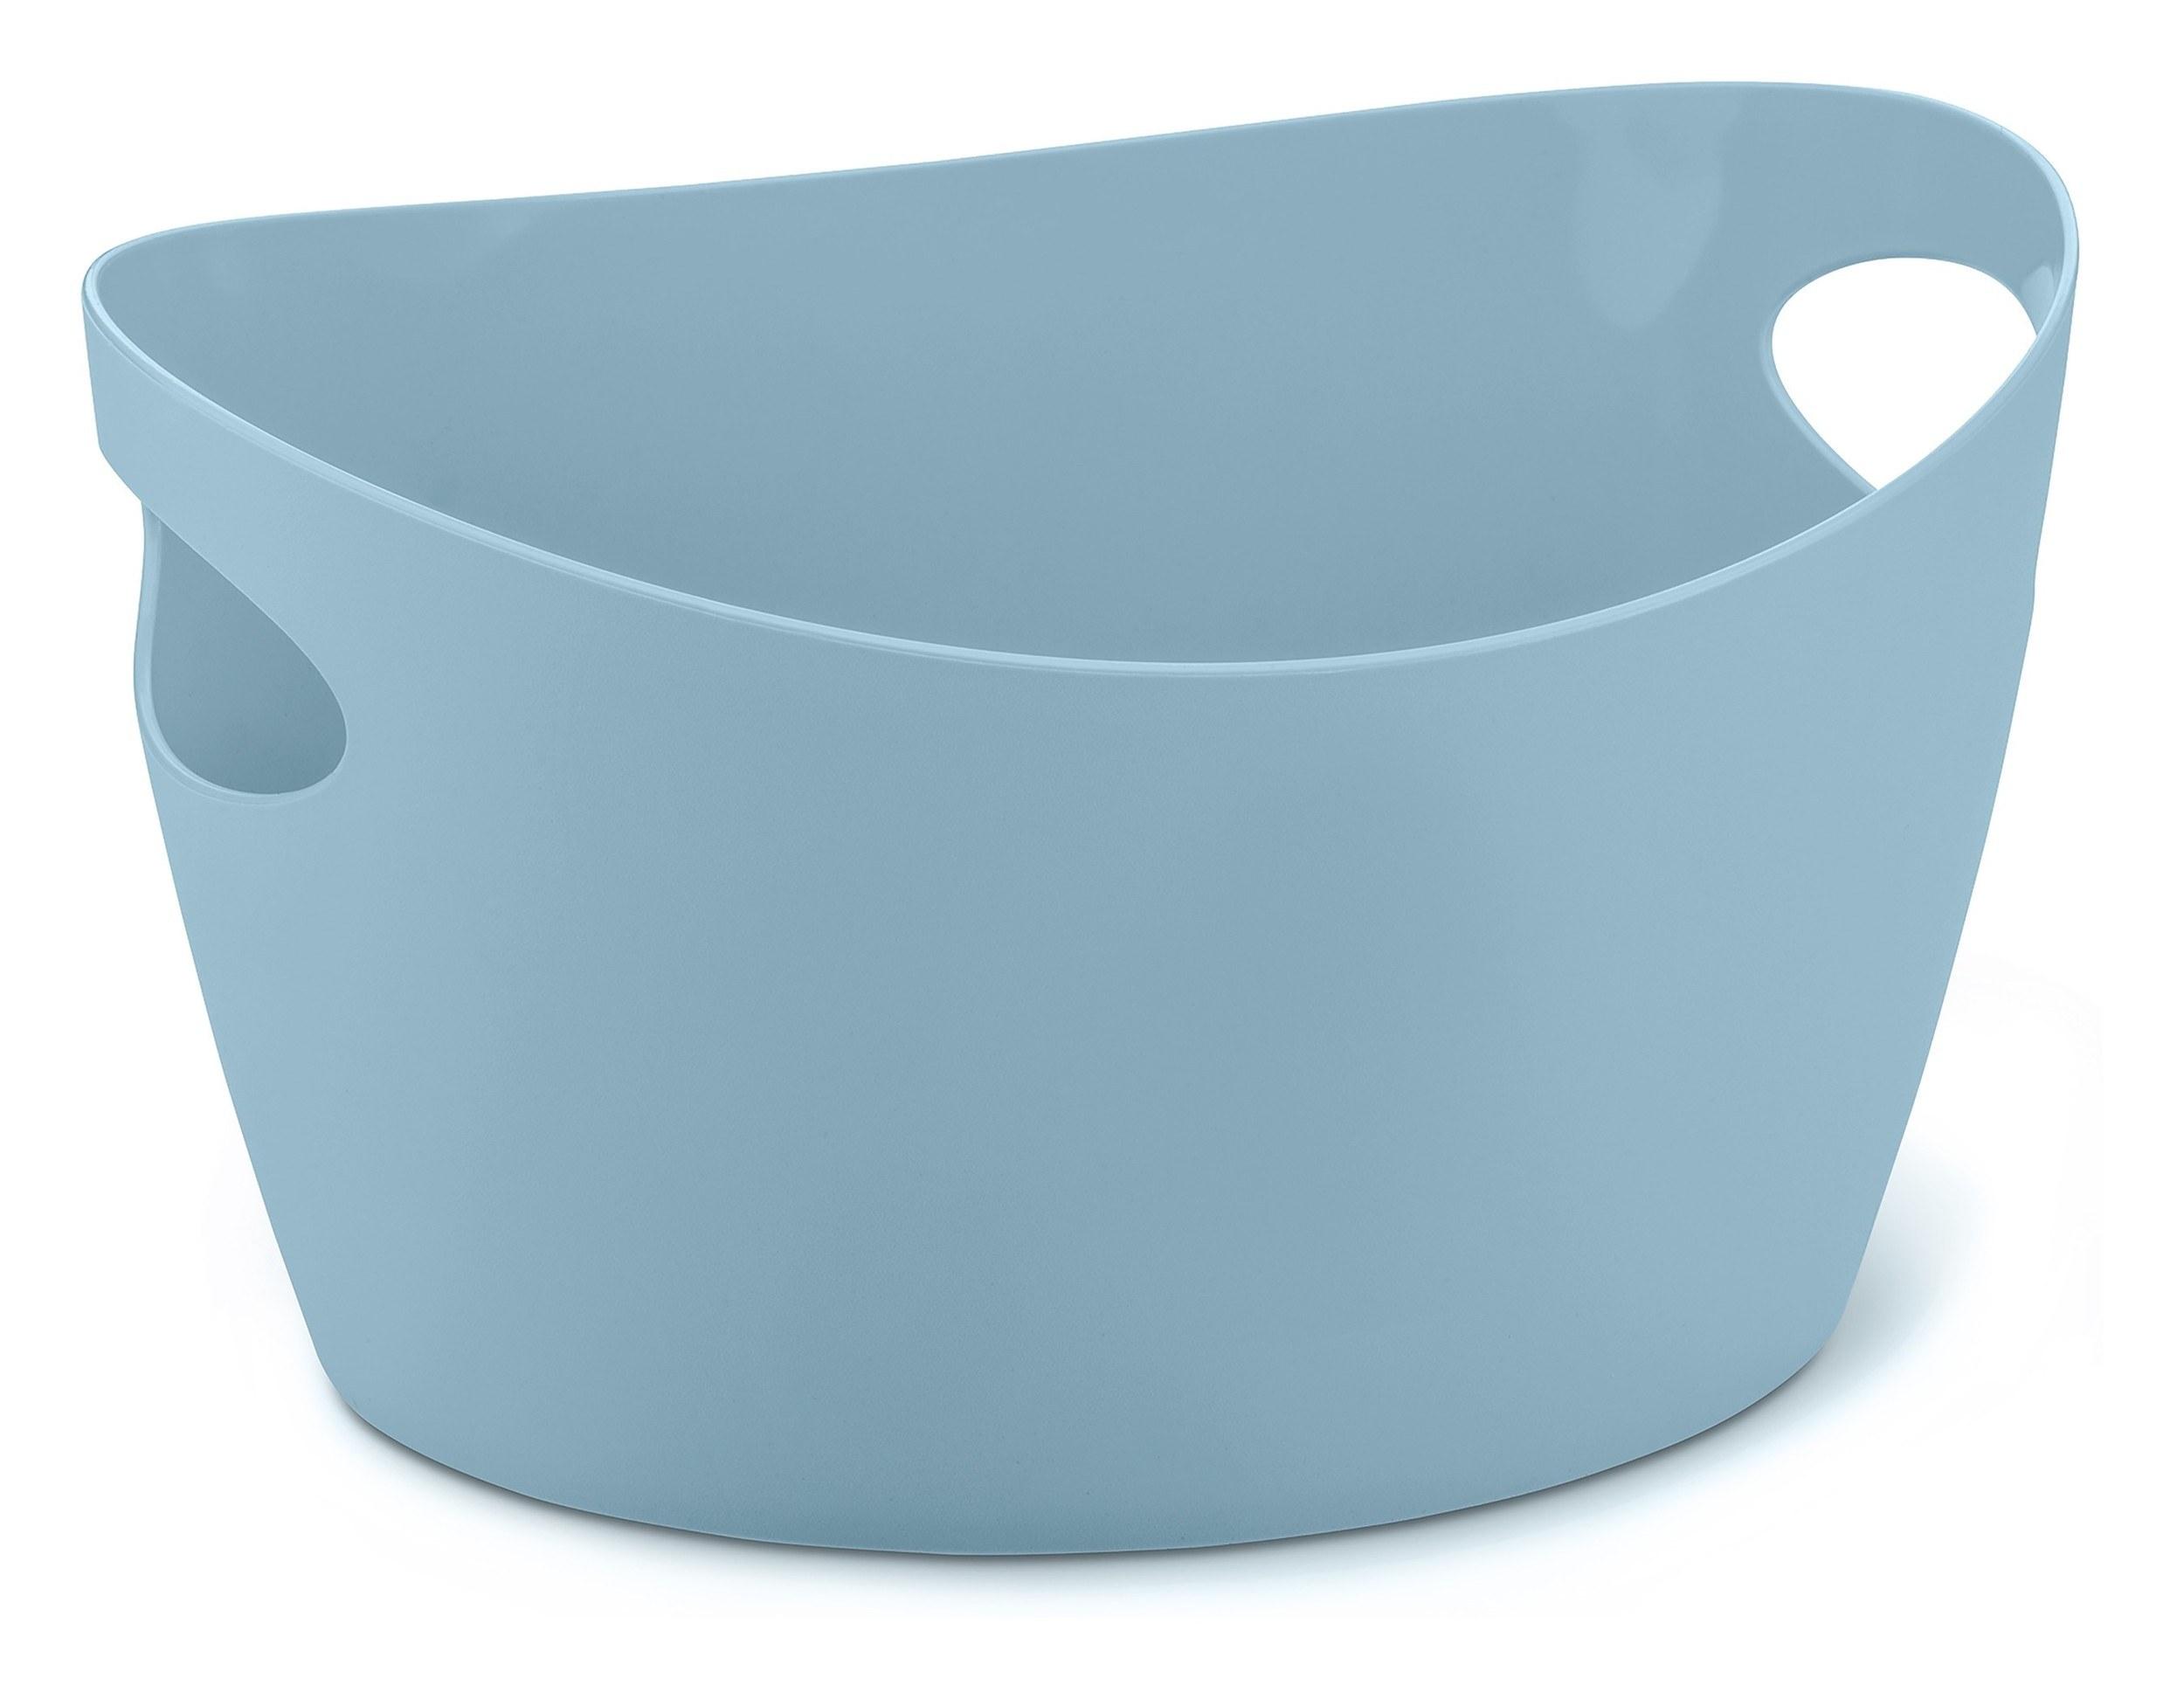 Miska Bottichelli S pastelowy błękit